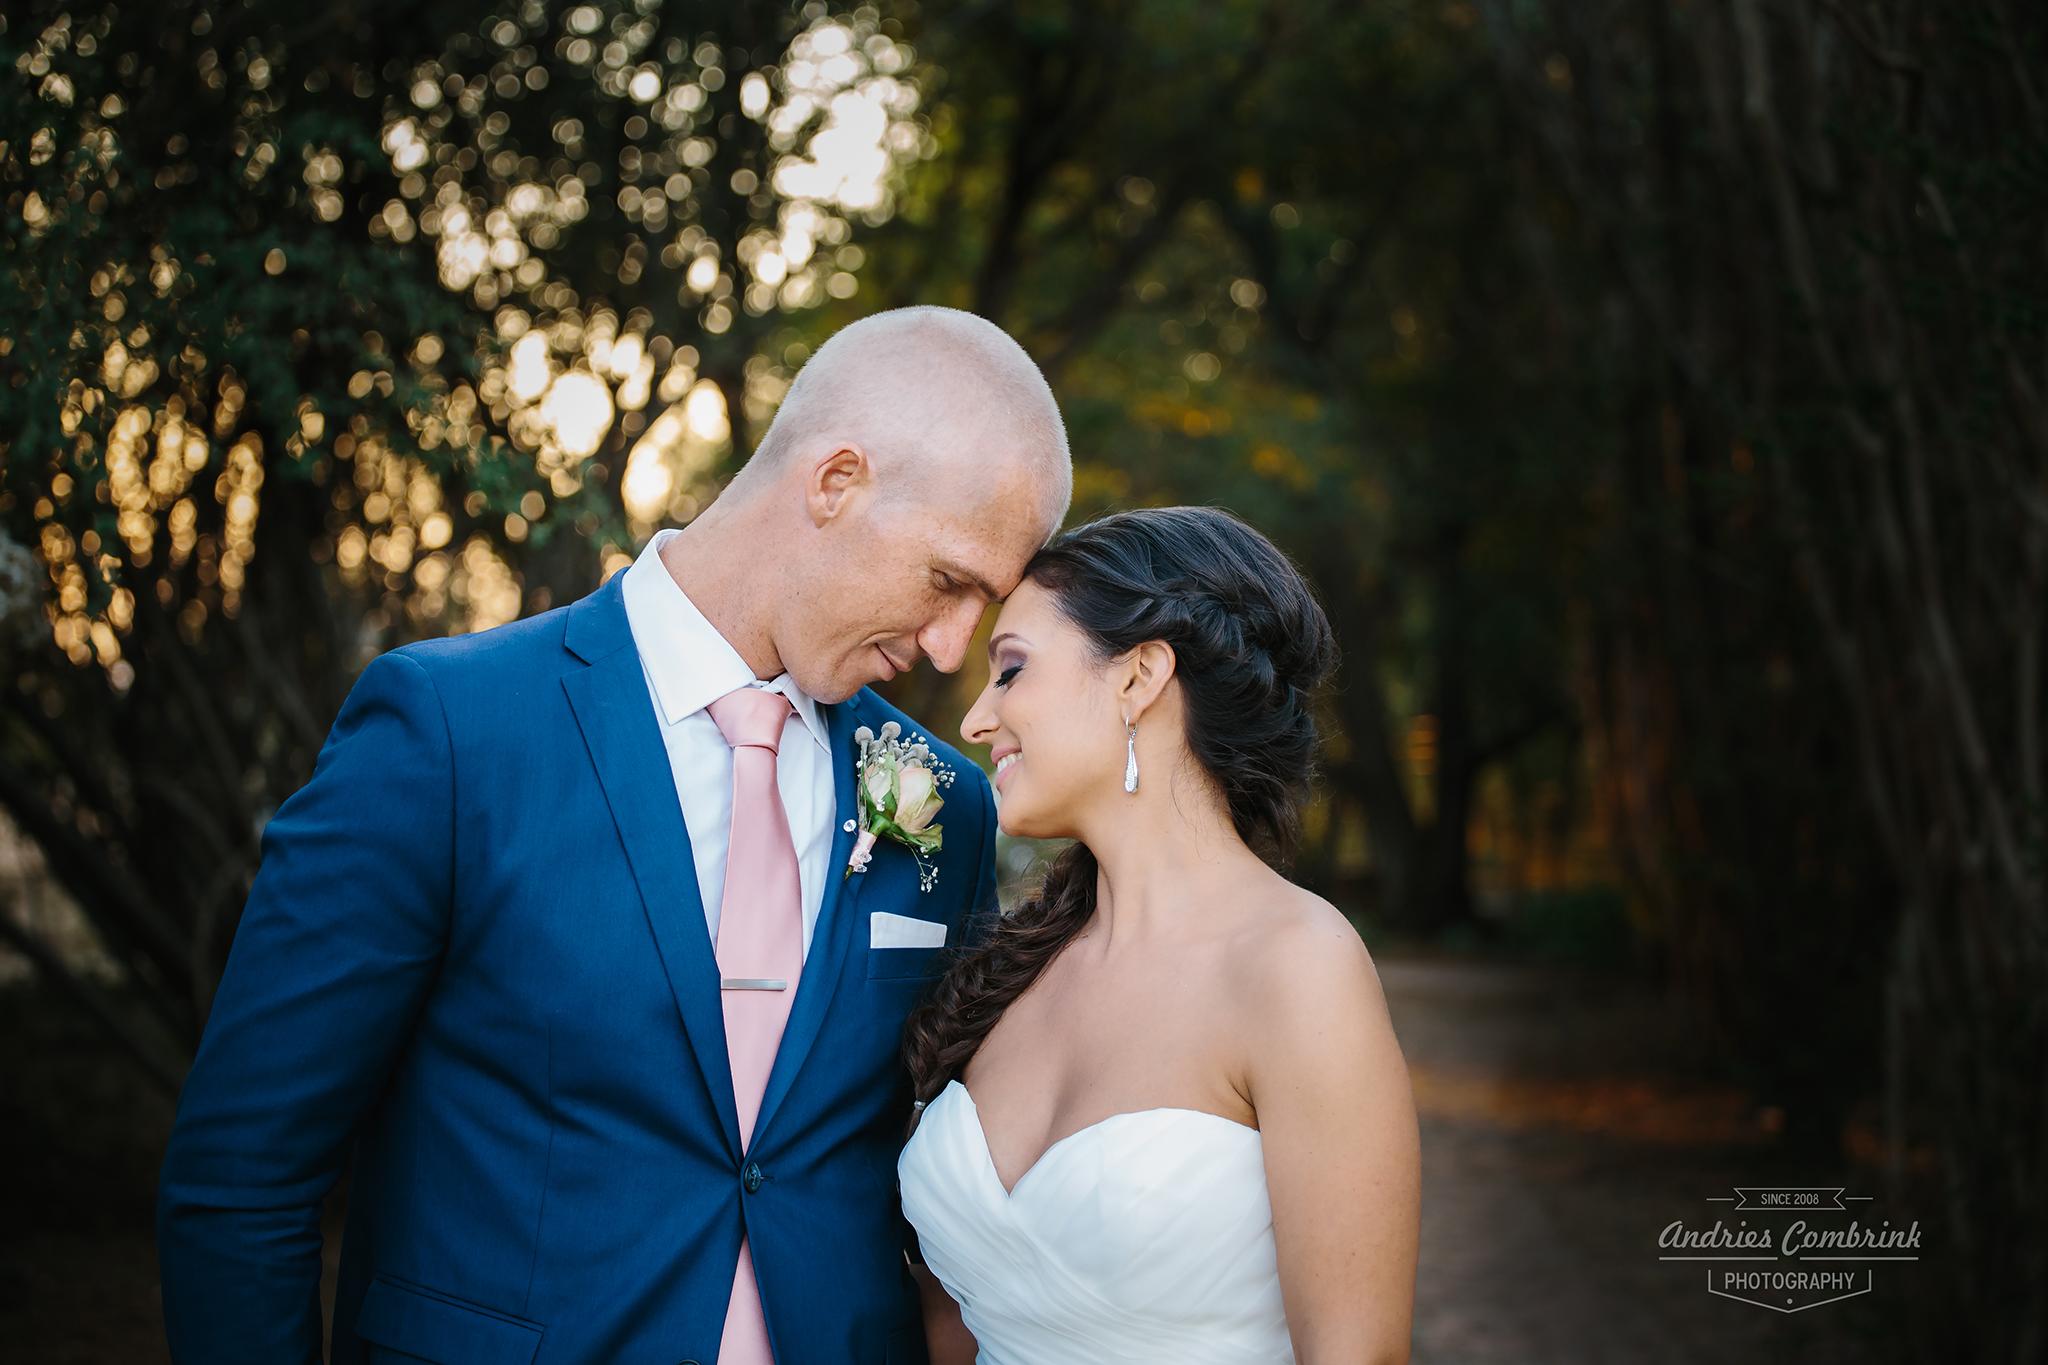 die akker wedding portrait